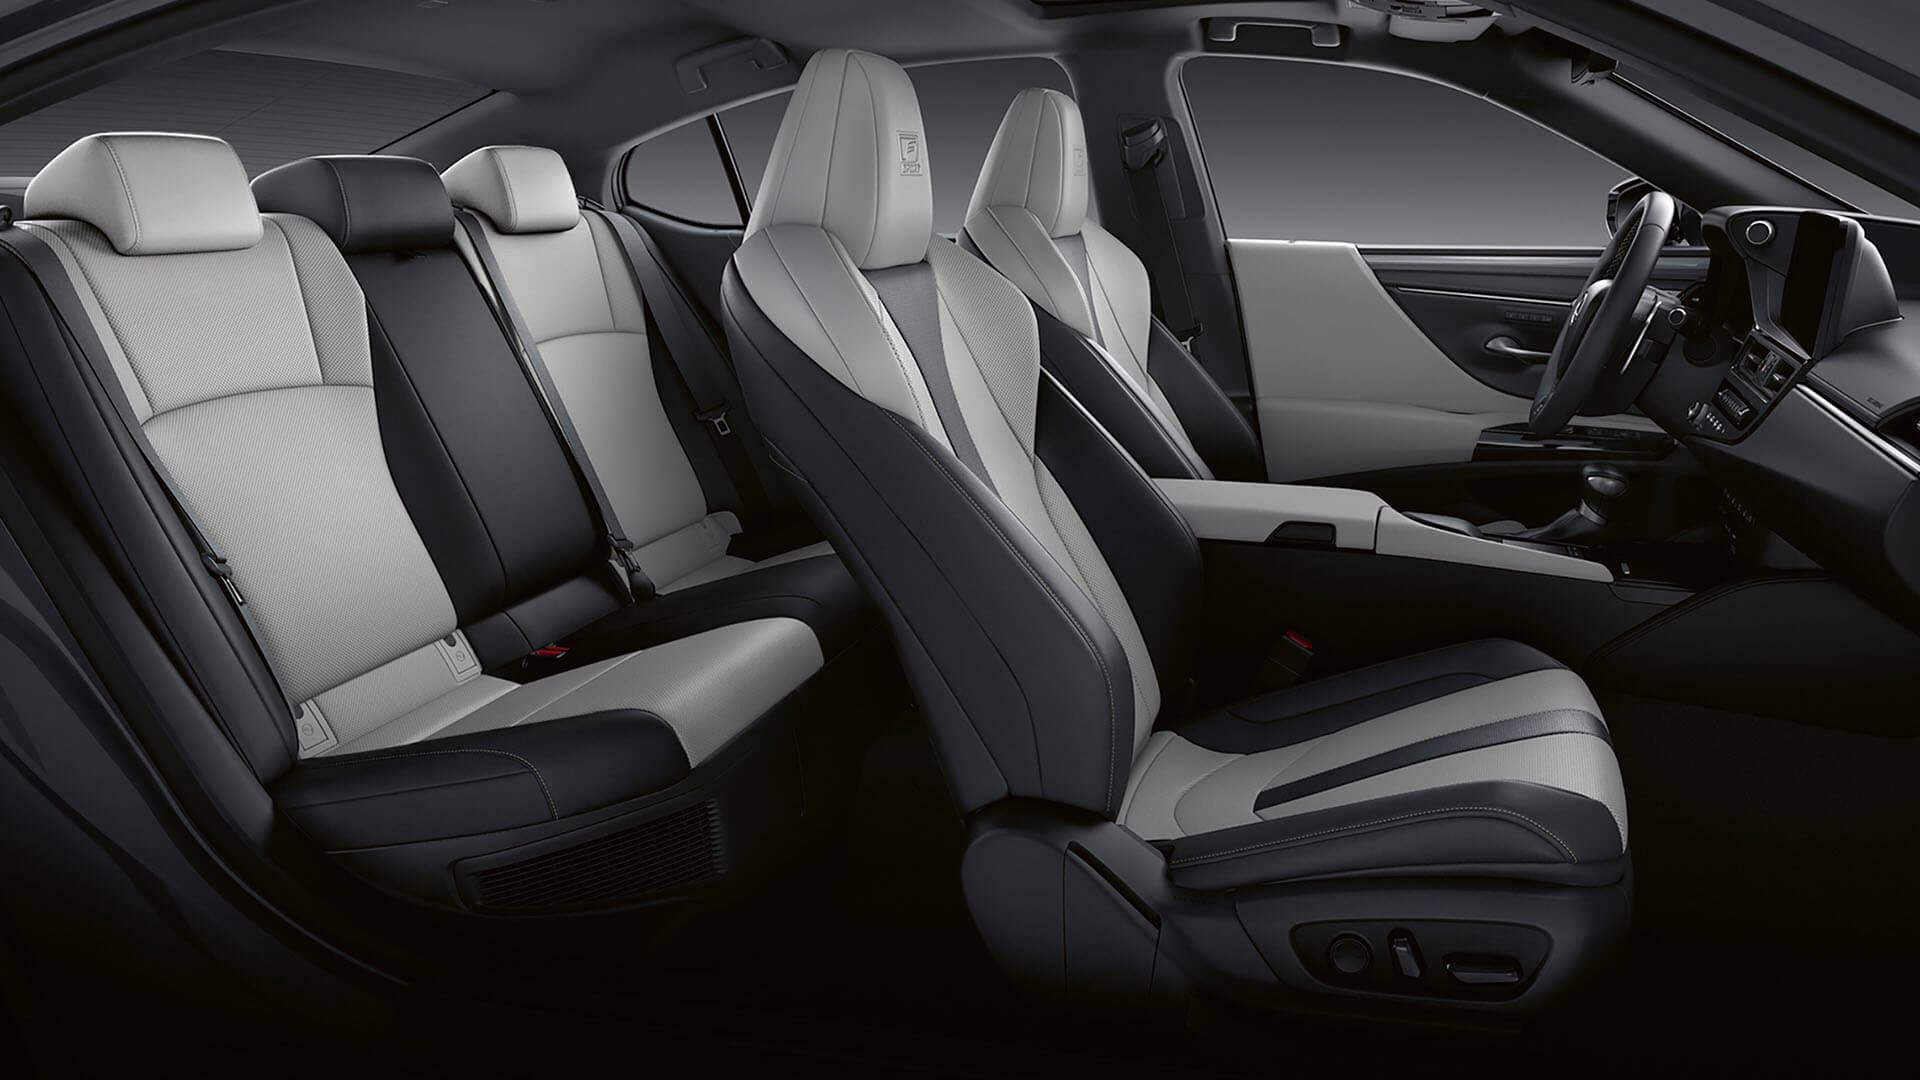 2022 lexus es experience interior front 16 way leather seats